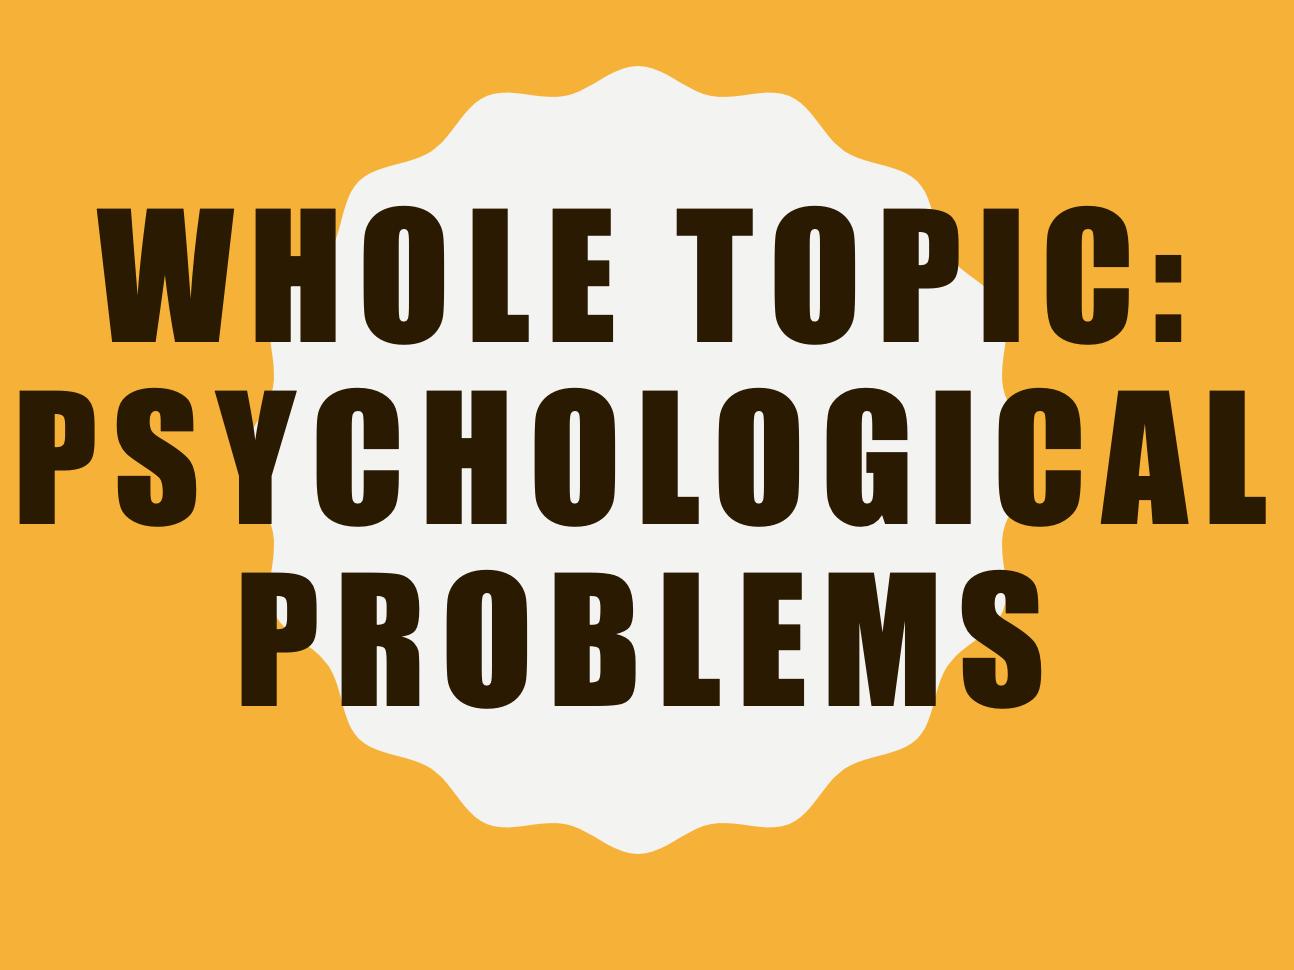 Full topic of Psychological Problems: 6 Lessons: AQA GCSE Pscyhology (New Spec)